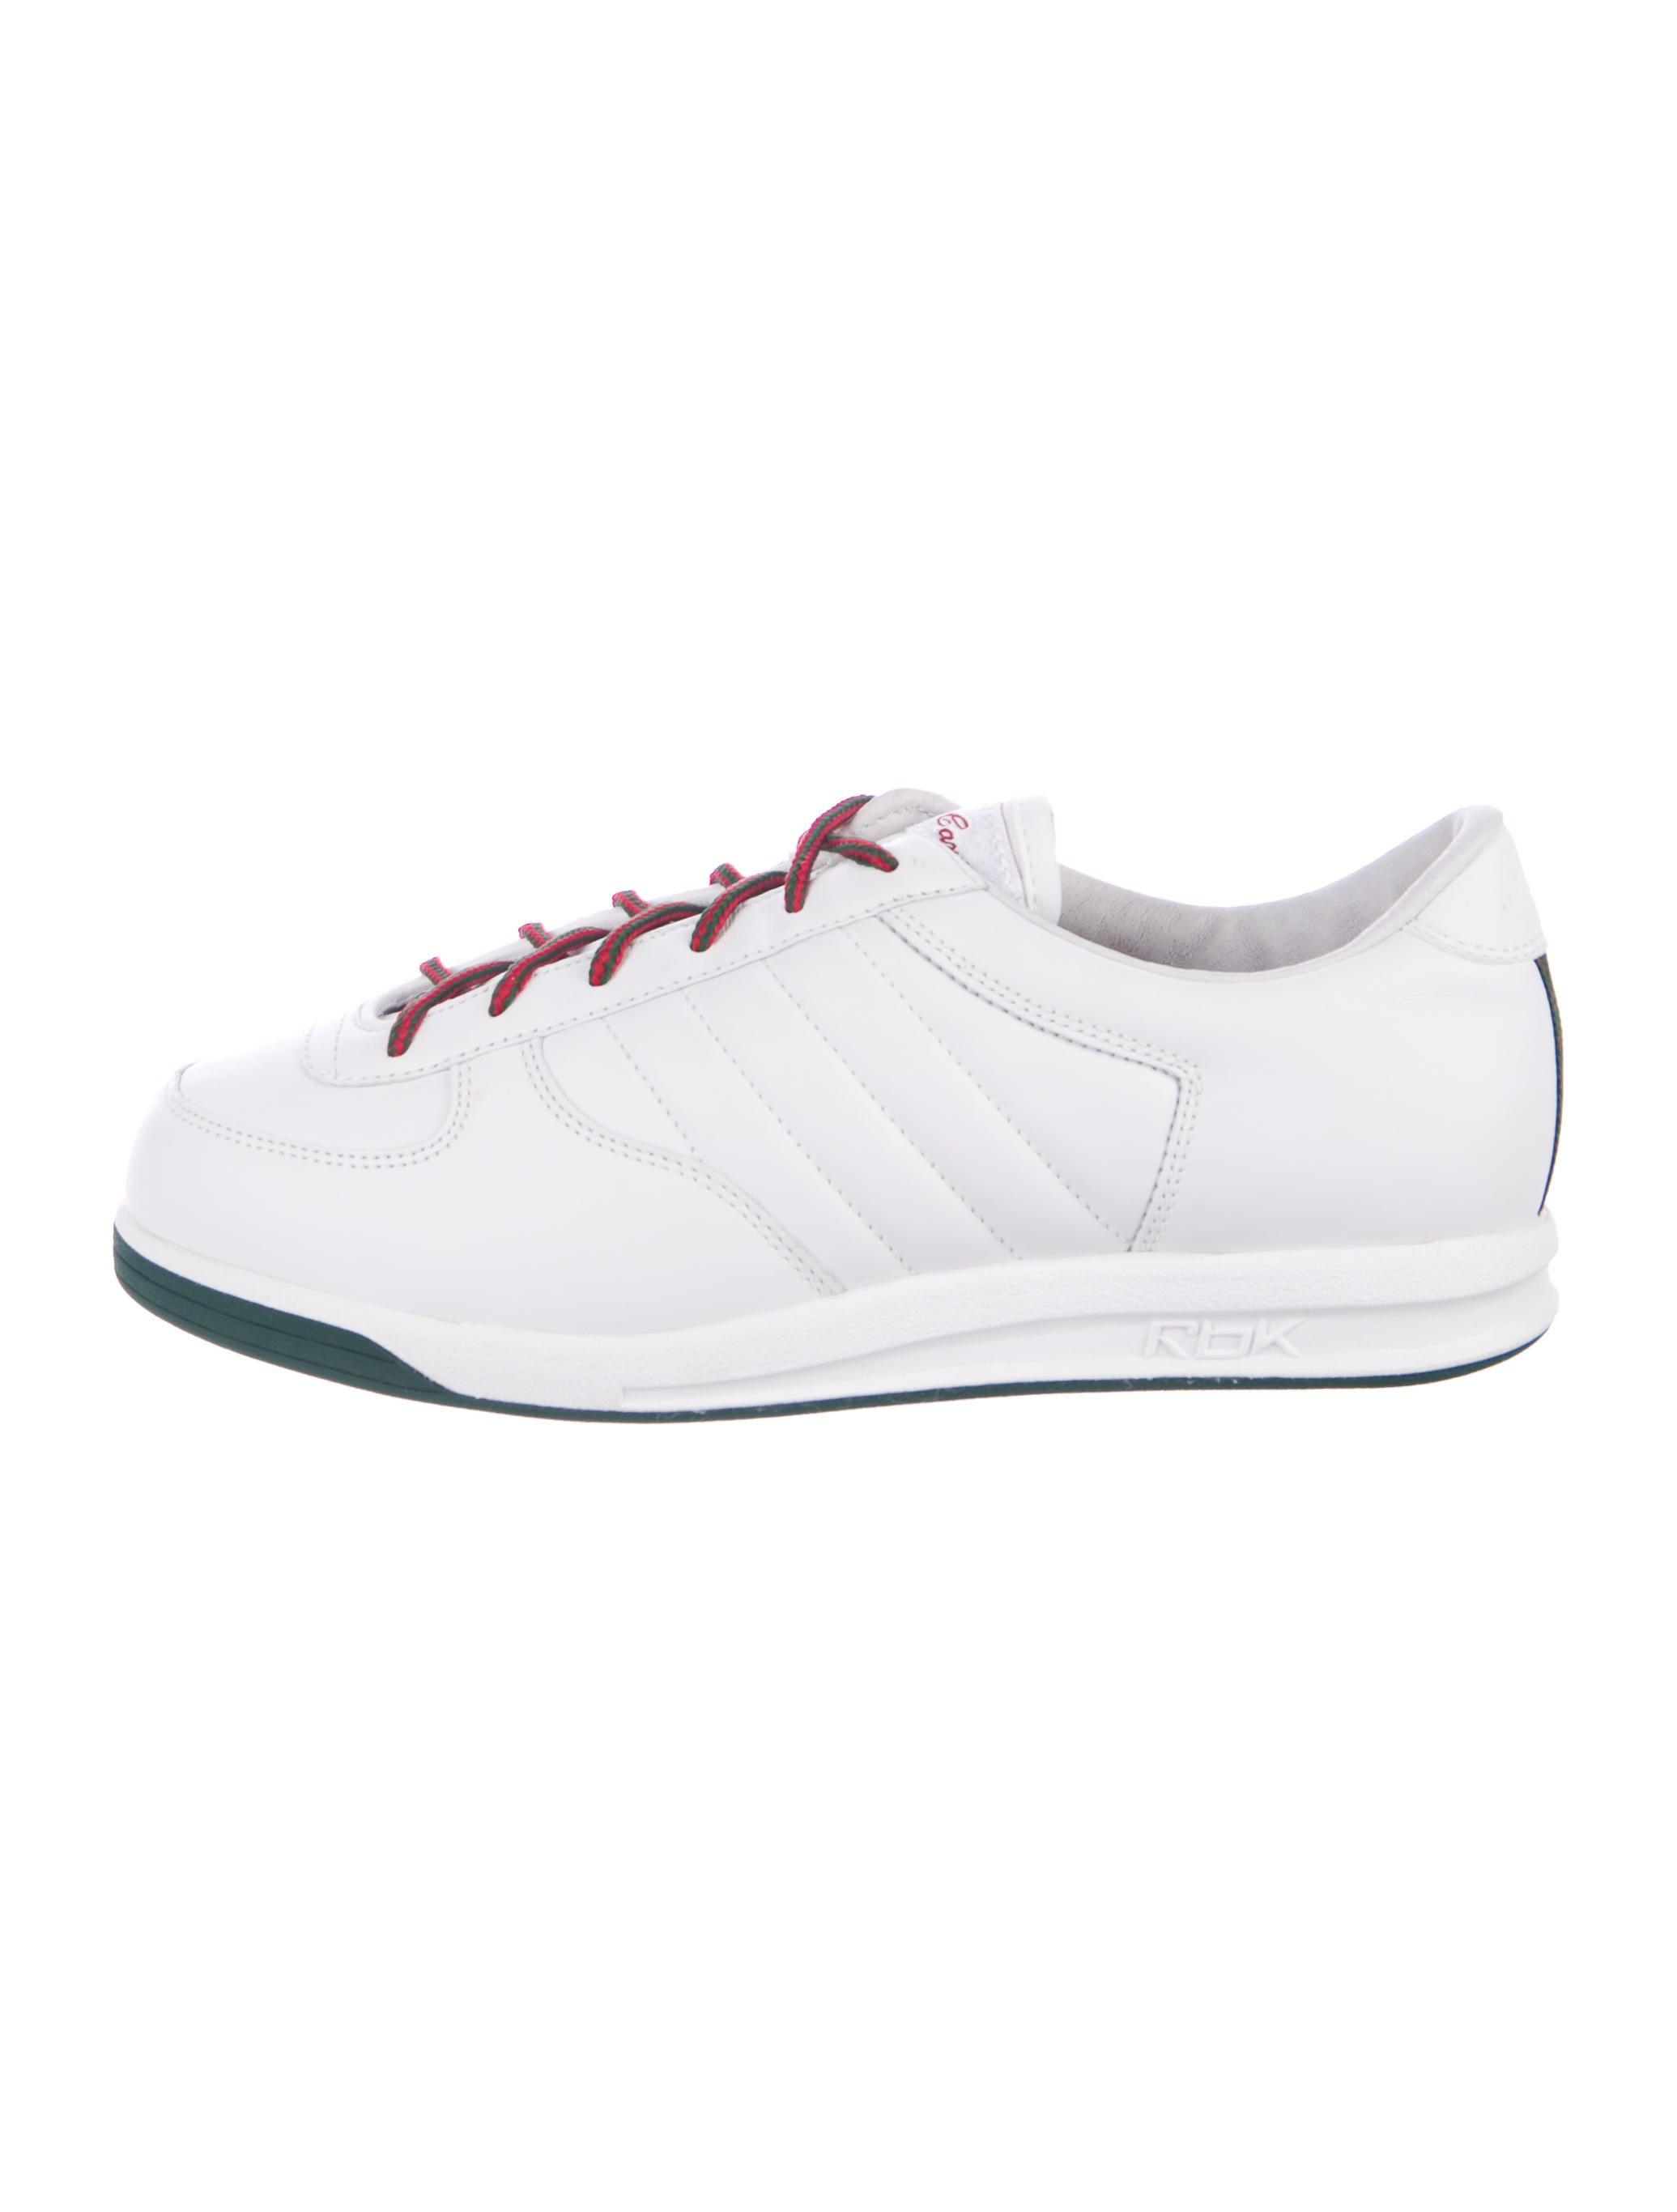 Reebok S. Carter Leather Sneakers